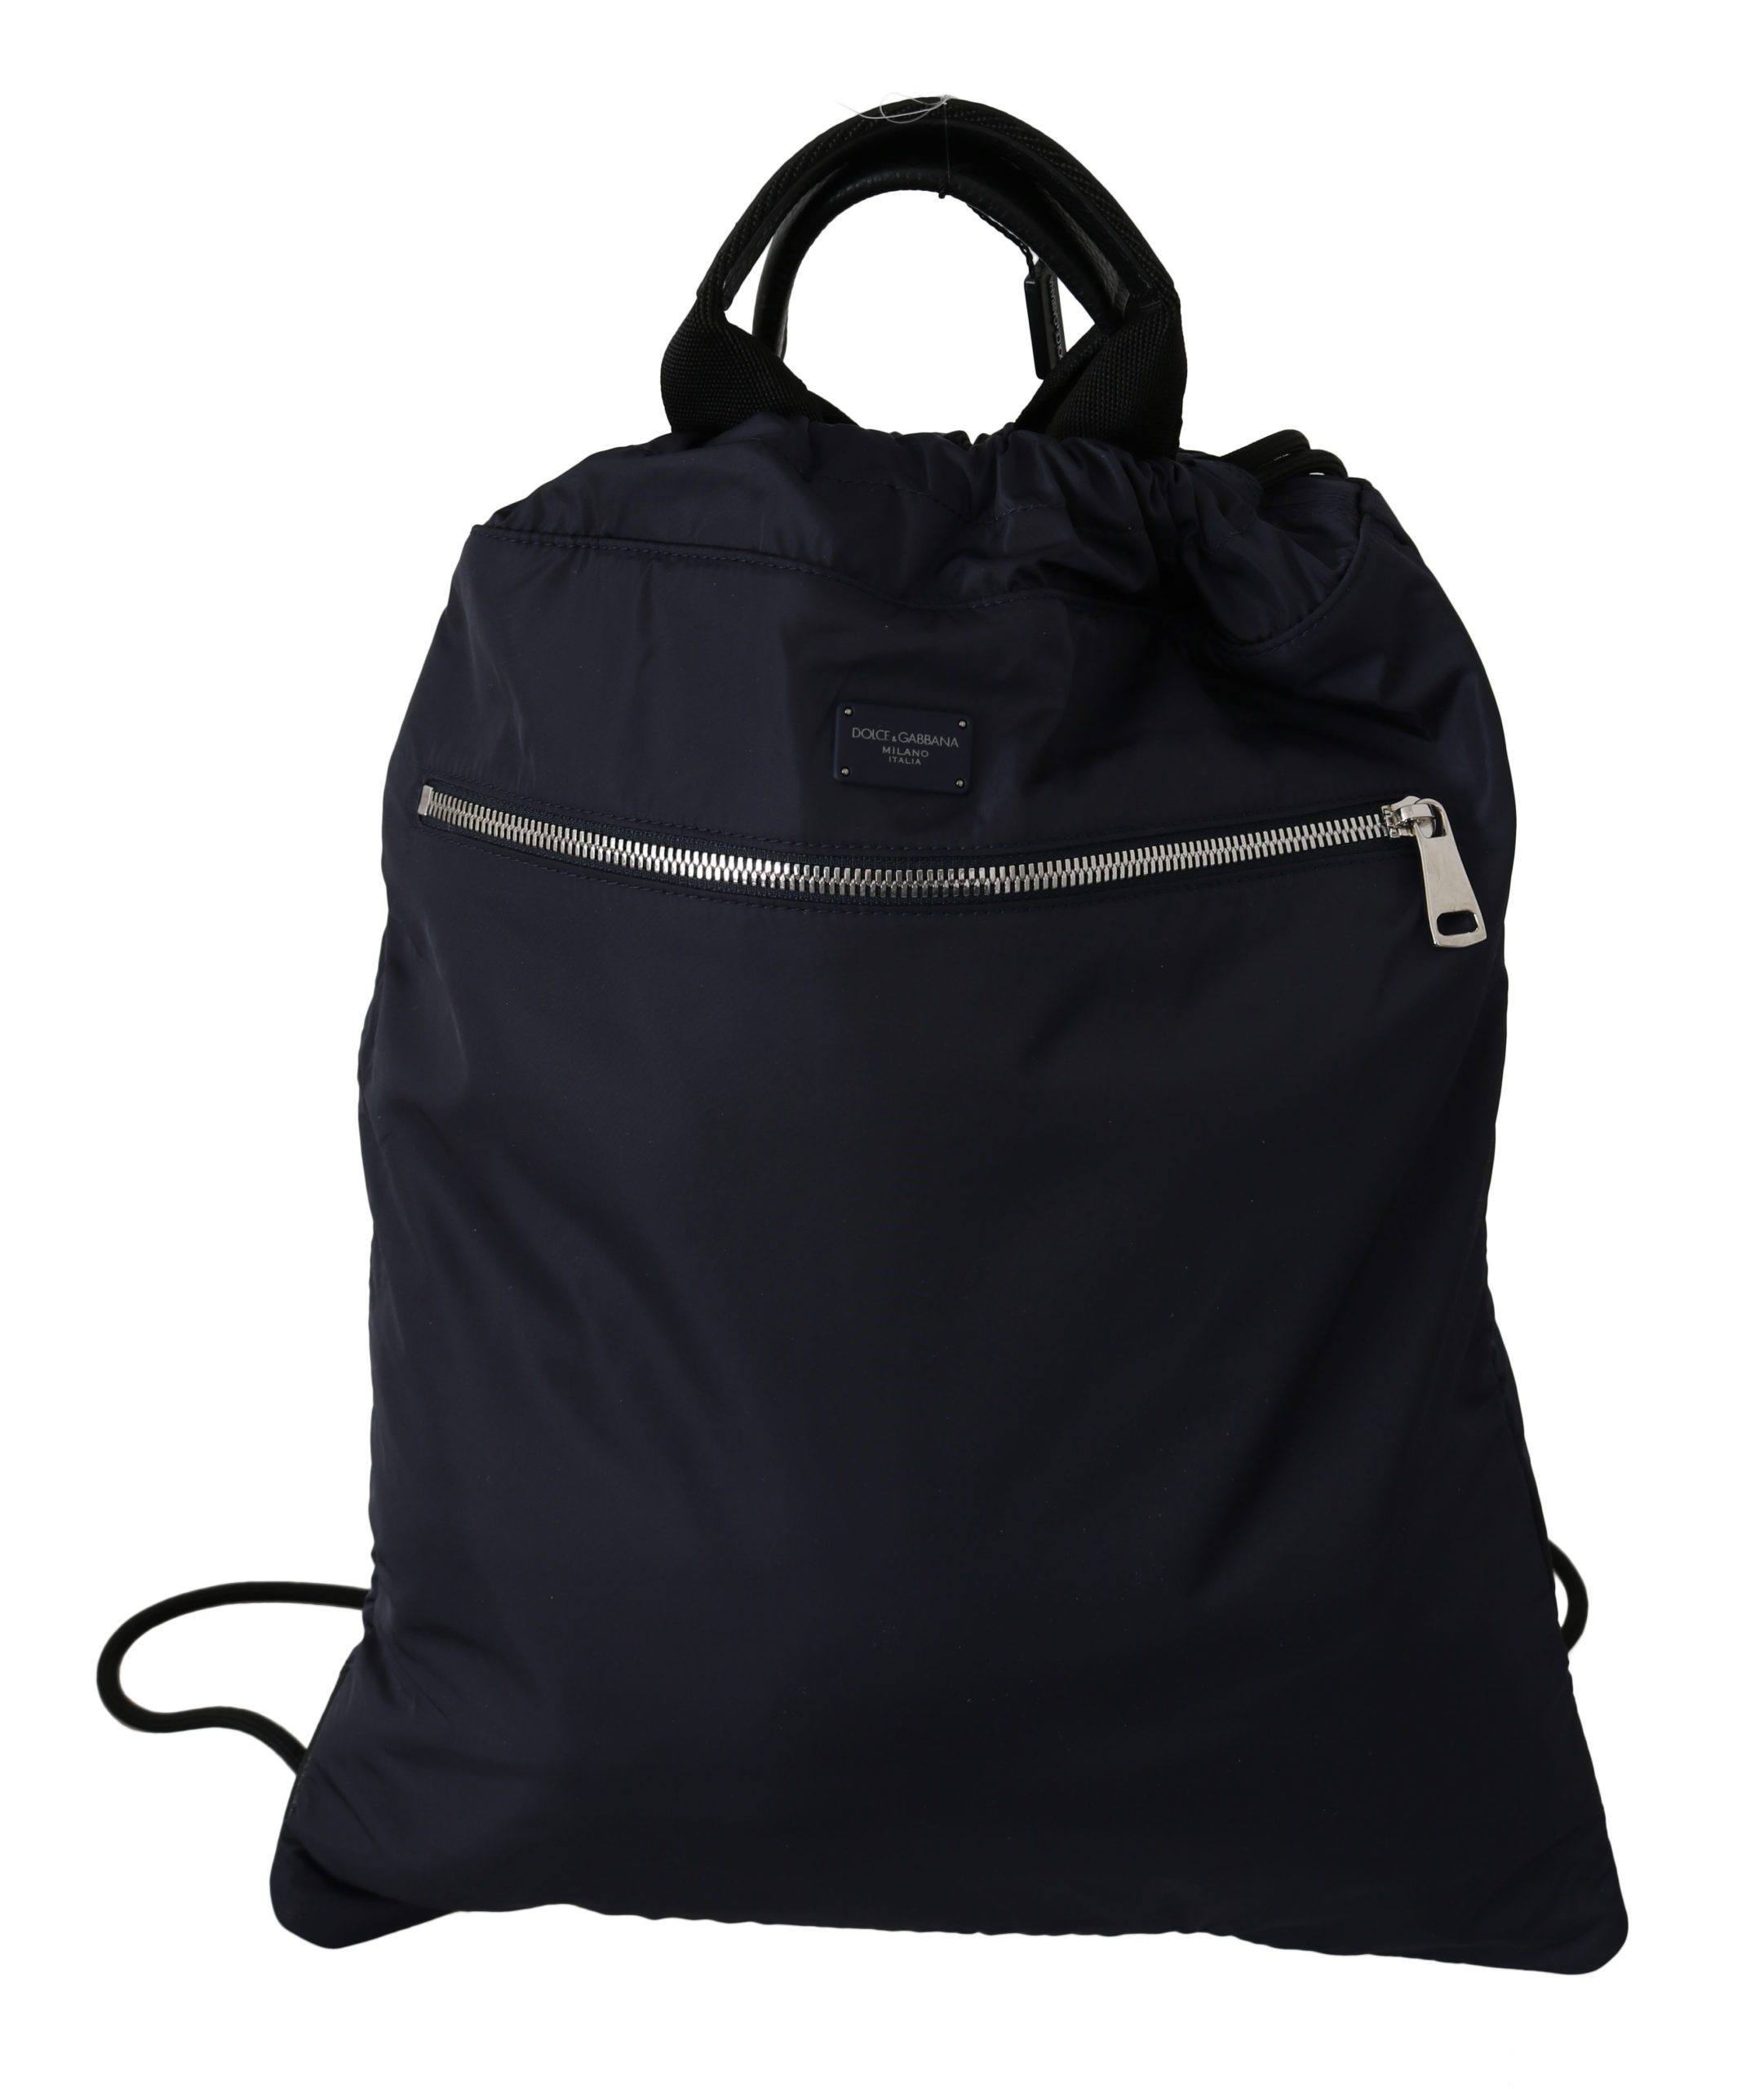 Dolce & Gabbana Men's Nylon Nap Sack Drawstring Backpack Black VAS8750